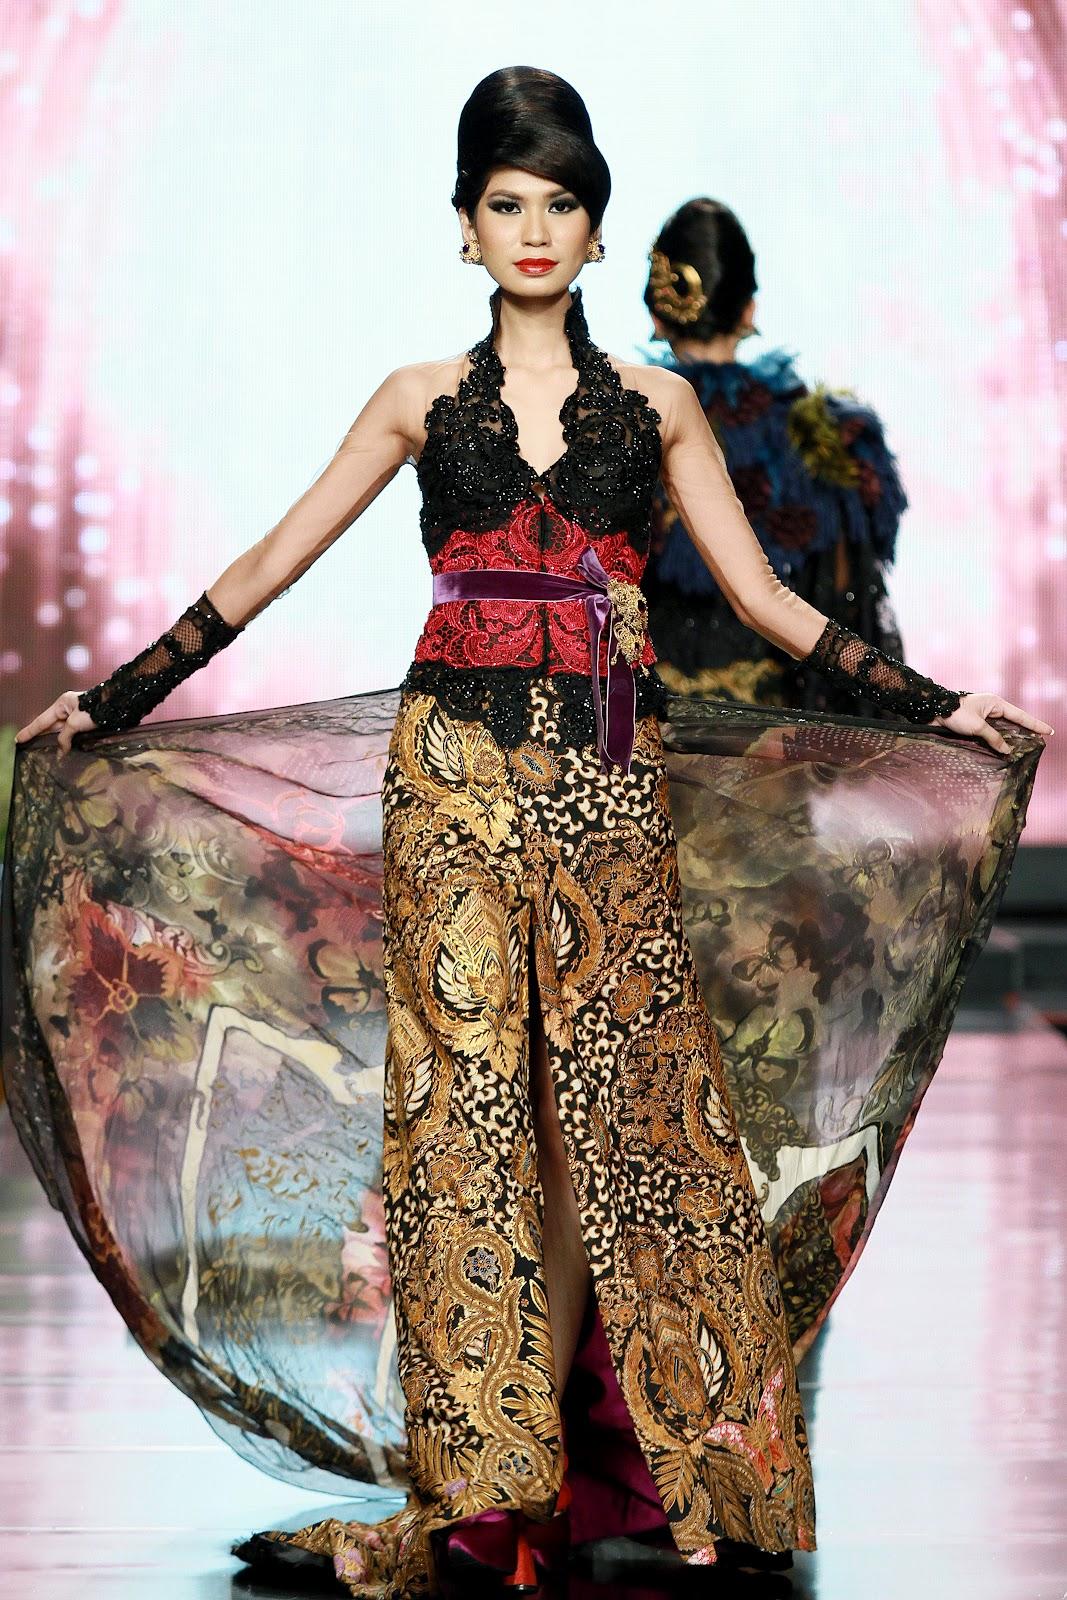 Batik Kebaya Anne Avantie - modernewohnkultur.webcam